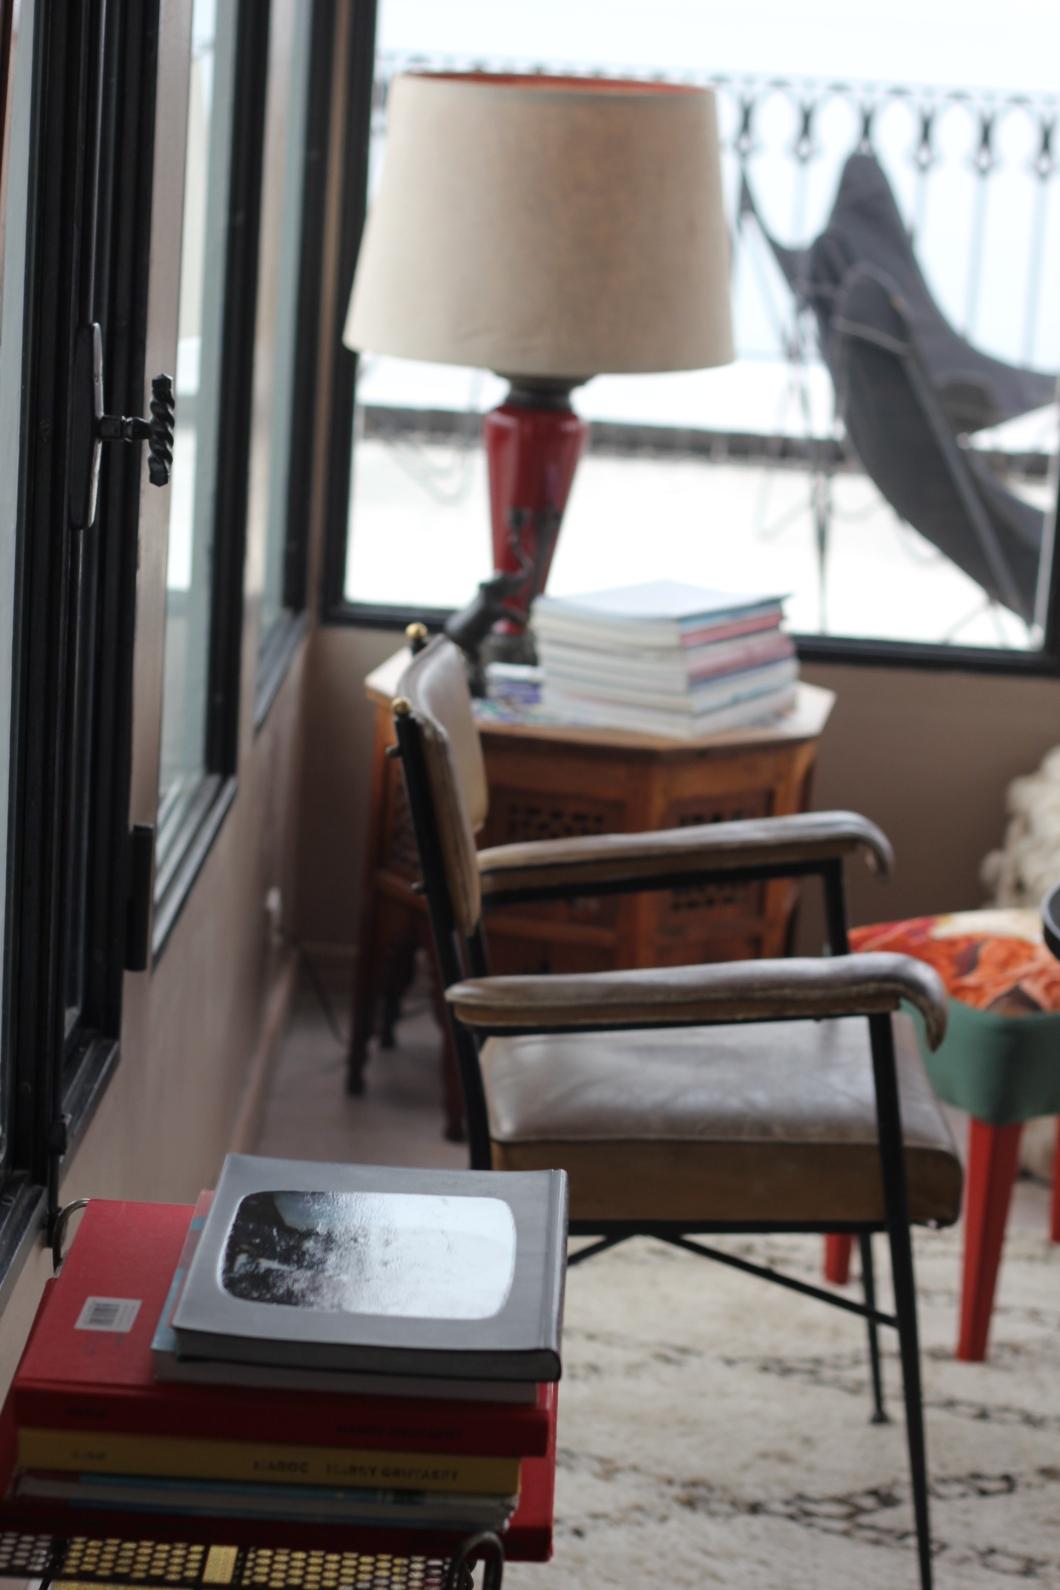 viajes marruecos turismo hoteles con encanto lifestyle blogger